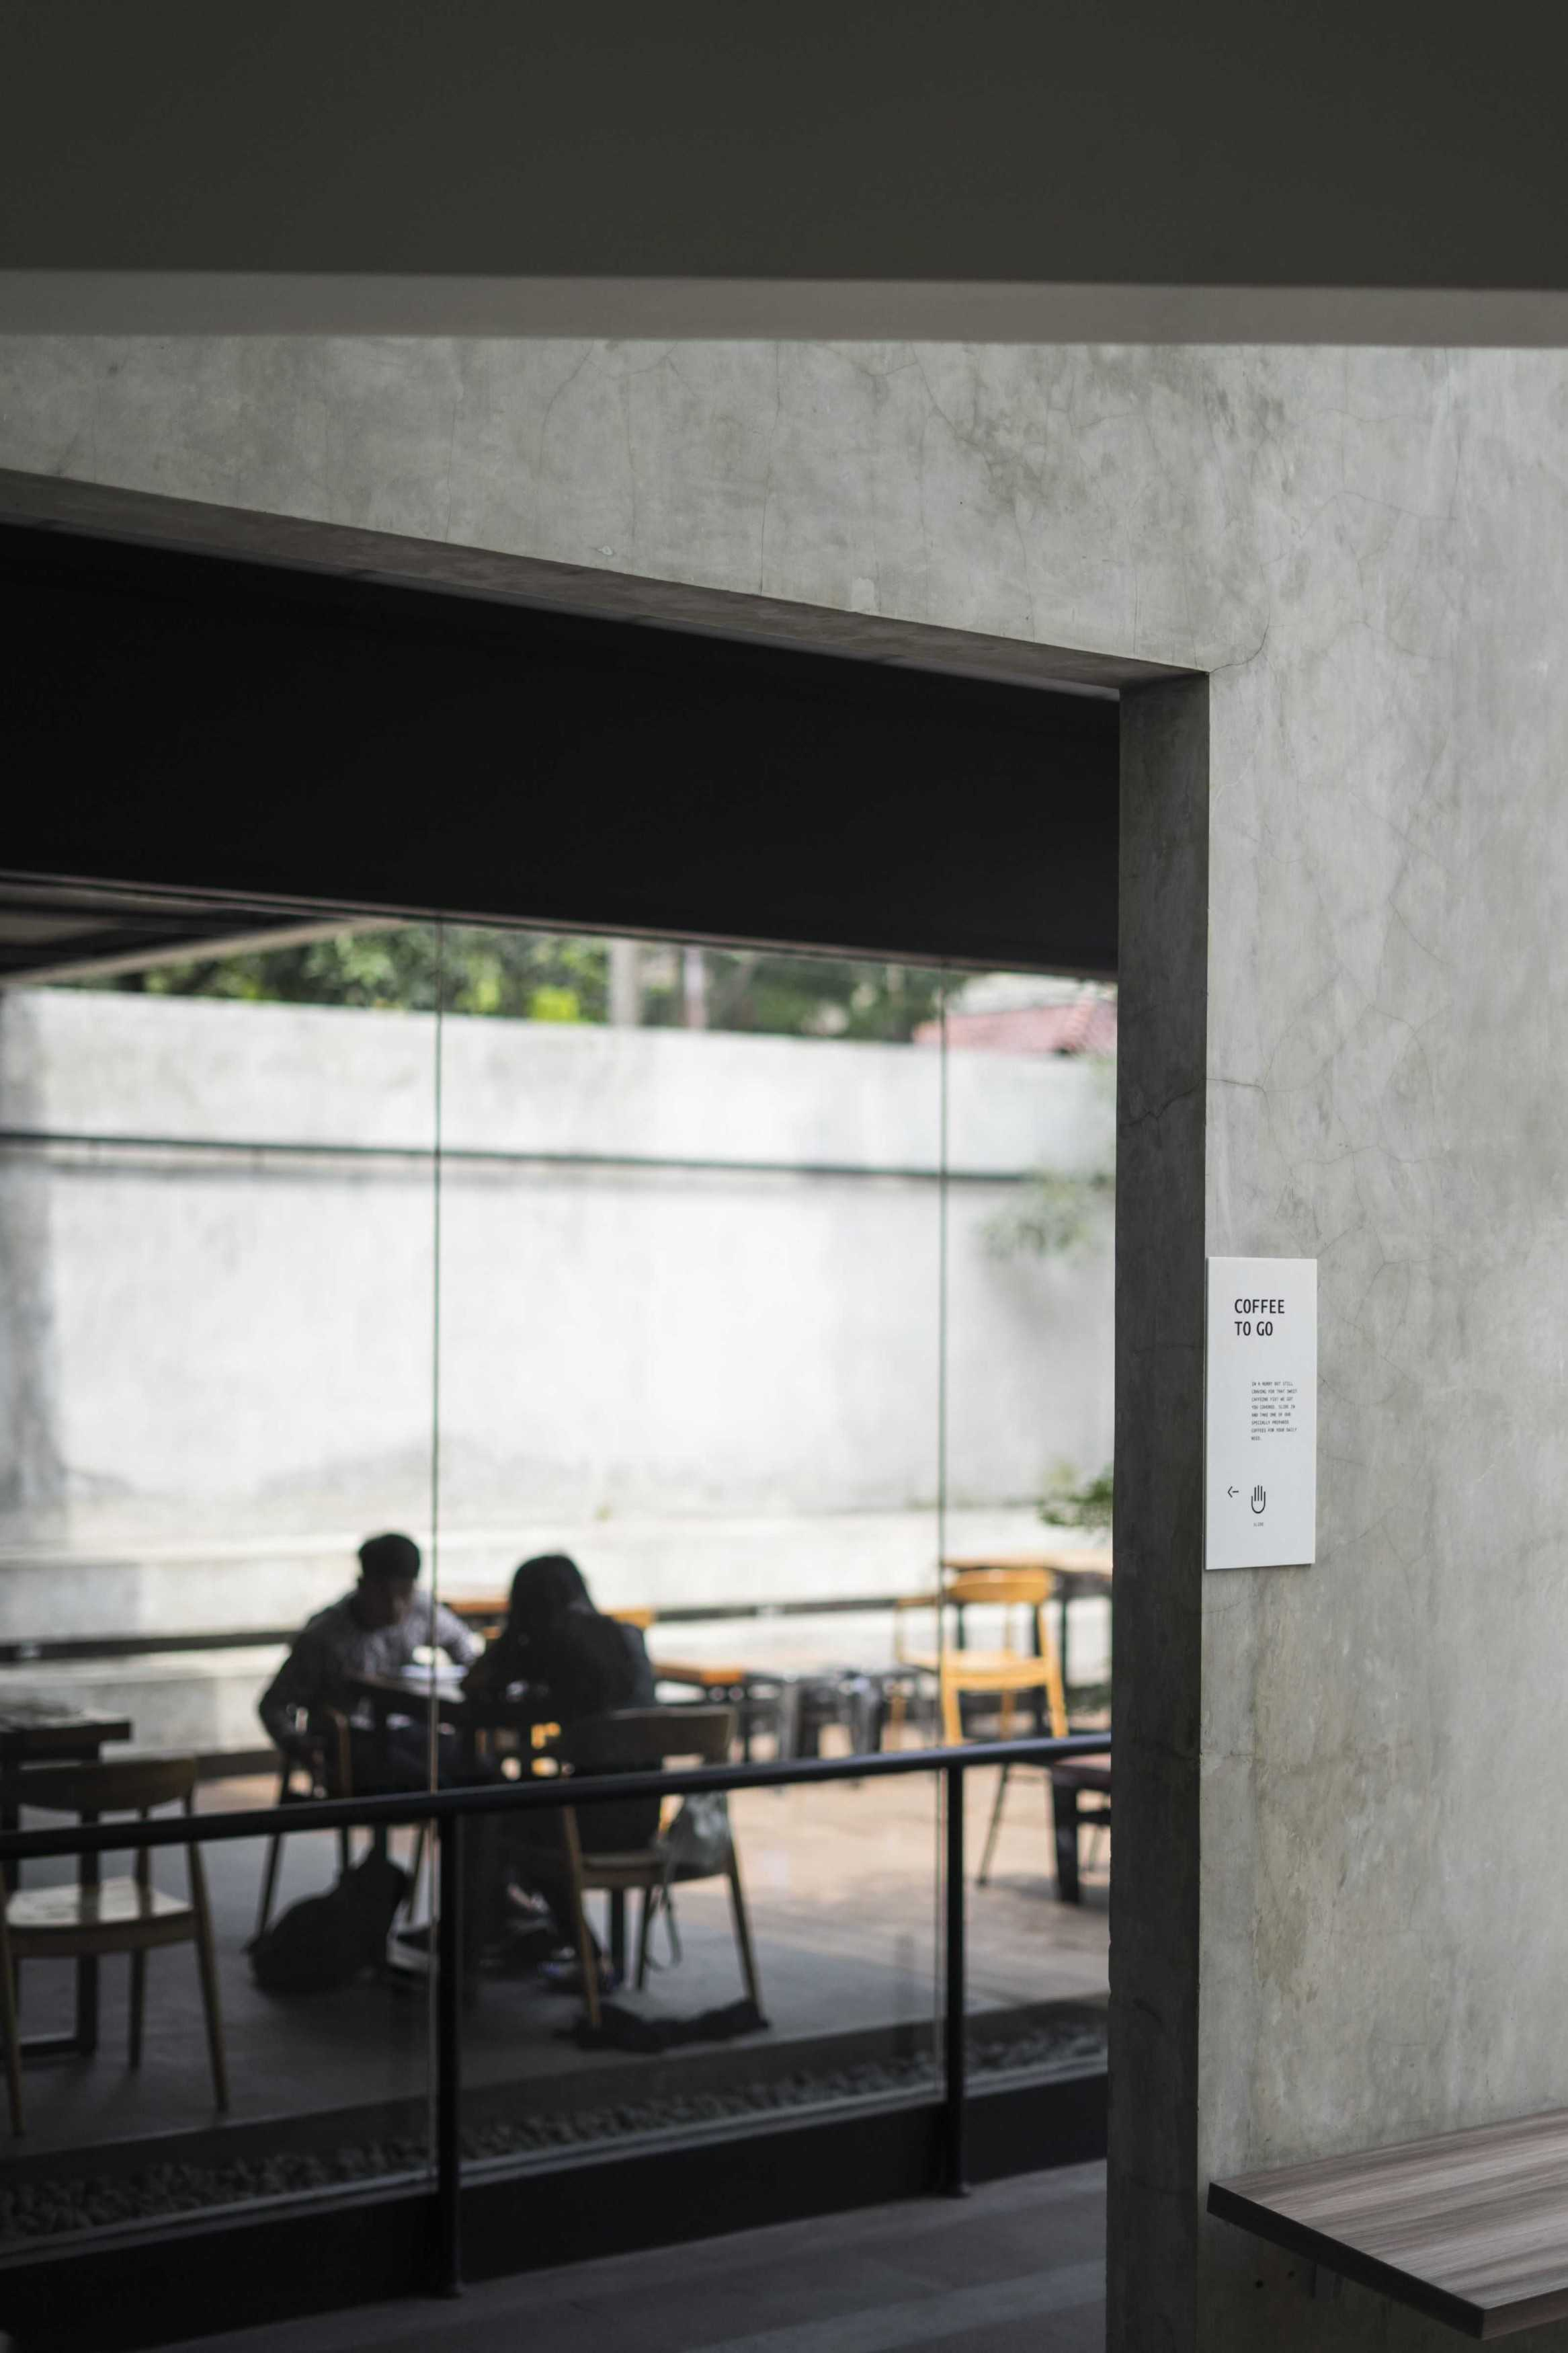 Aaksen Responsible Aarchitecture Ruckerpark Coffee And Culture Jl. Dr. Cipto No.24, Pasir Kaliki, Cicendo, Kota Bandung, Jawa Barat 40171, Indonesia Jl. Dr. Cipto No.24, Pasir Kaliki, Cicendo, Kota Bandung, Jawa Barat 40171, Indonesia Aaksen-Responsible-Architecture-Ruckerpark-Coffee-And-Culture   57194